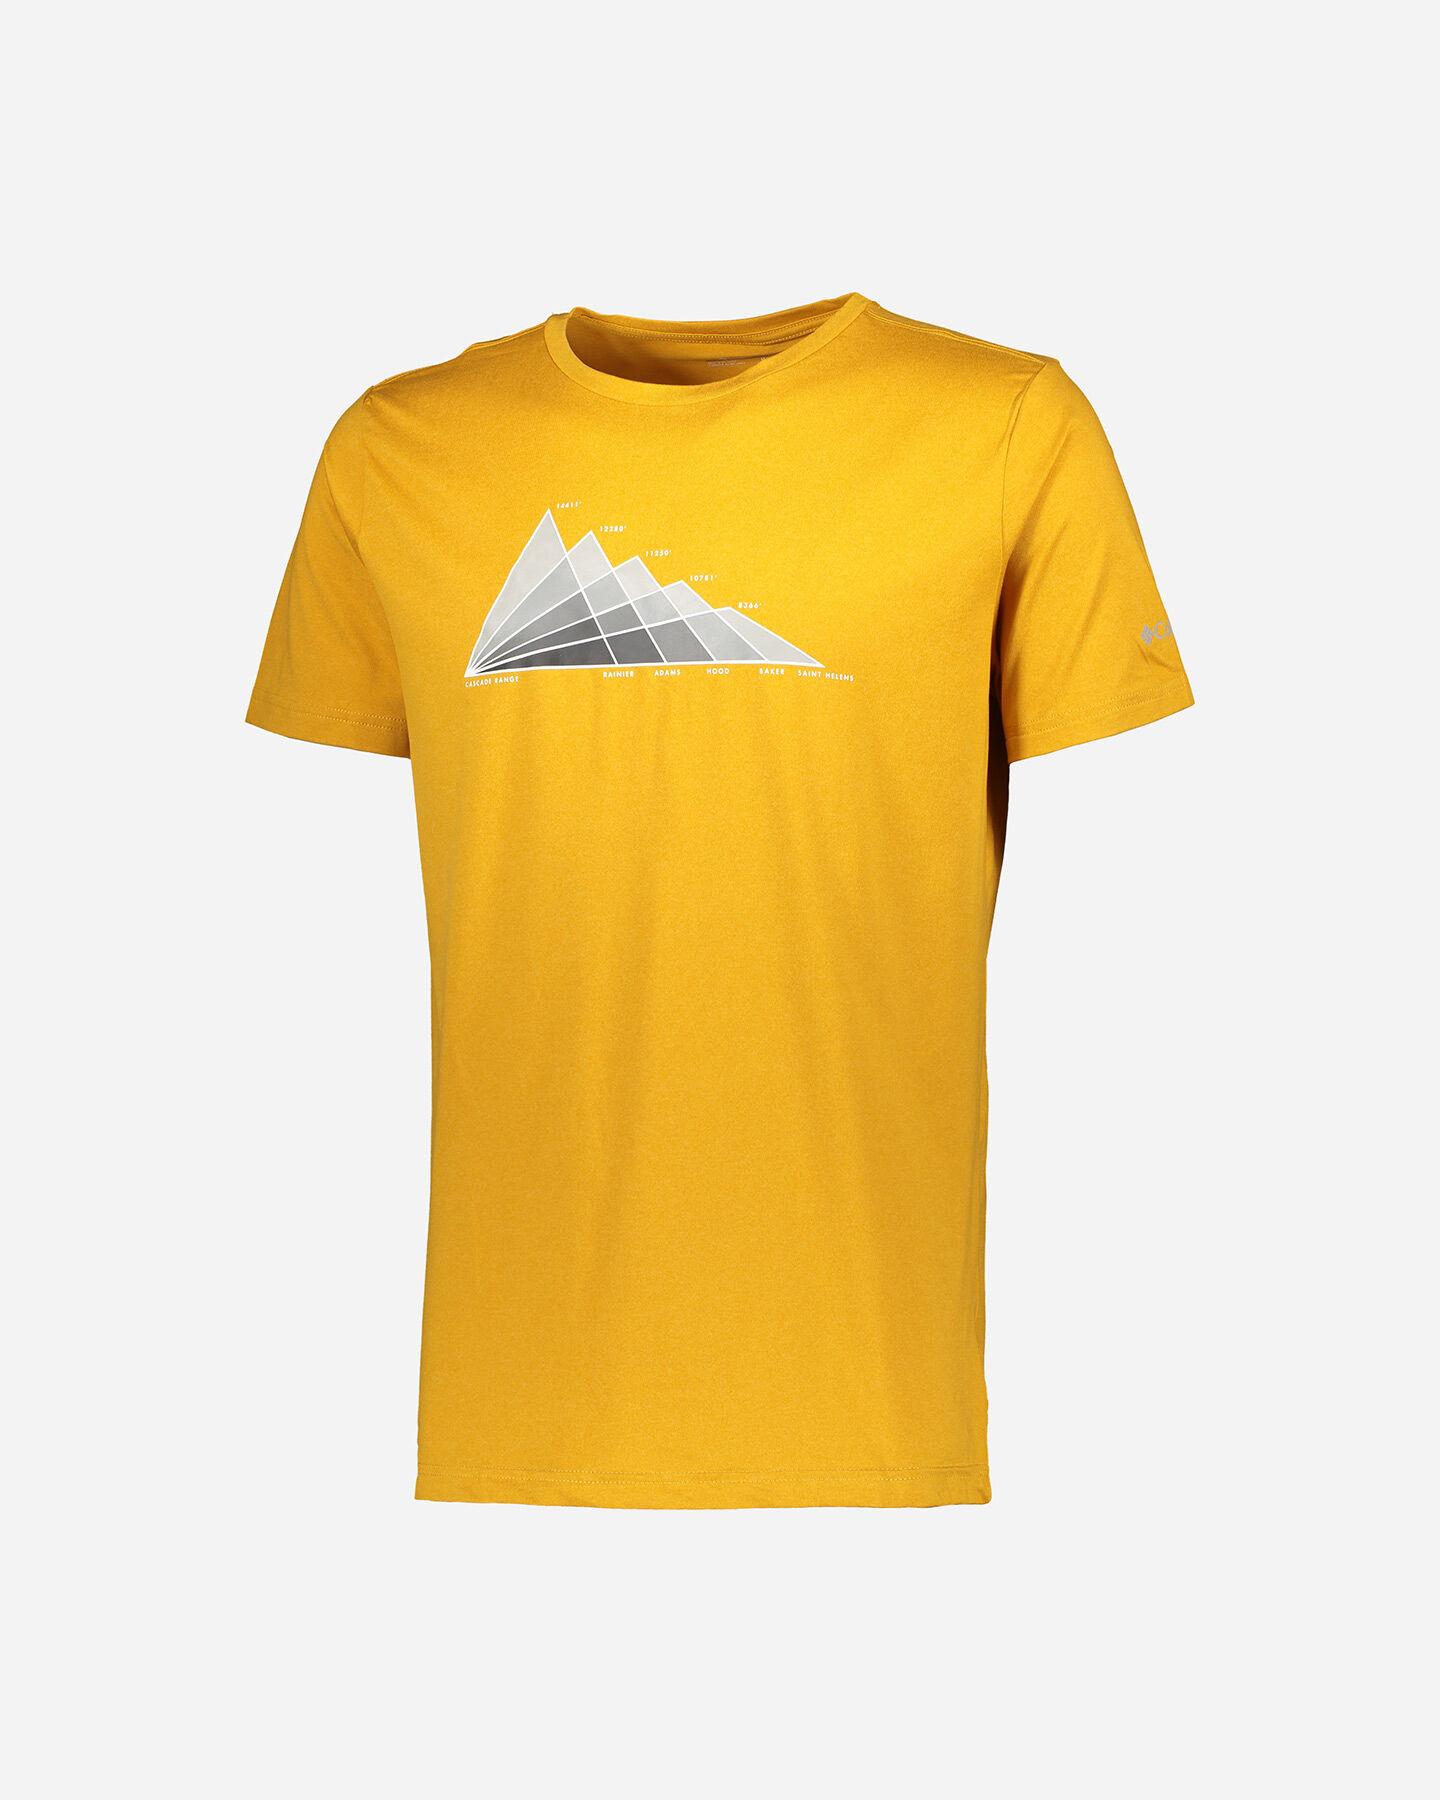 T-Shirt COLUMBIA TECH TRAIL GRAPHIC M S5291753 scatto 0